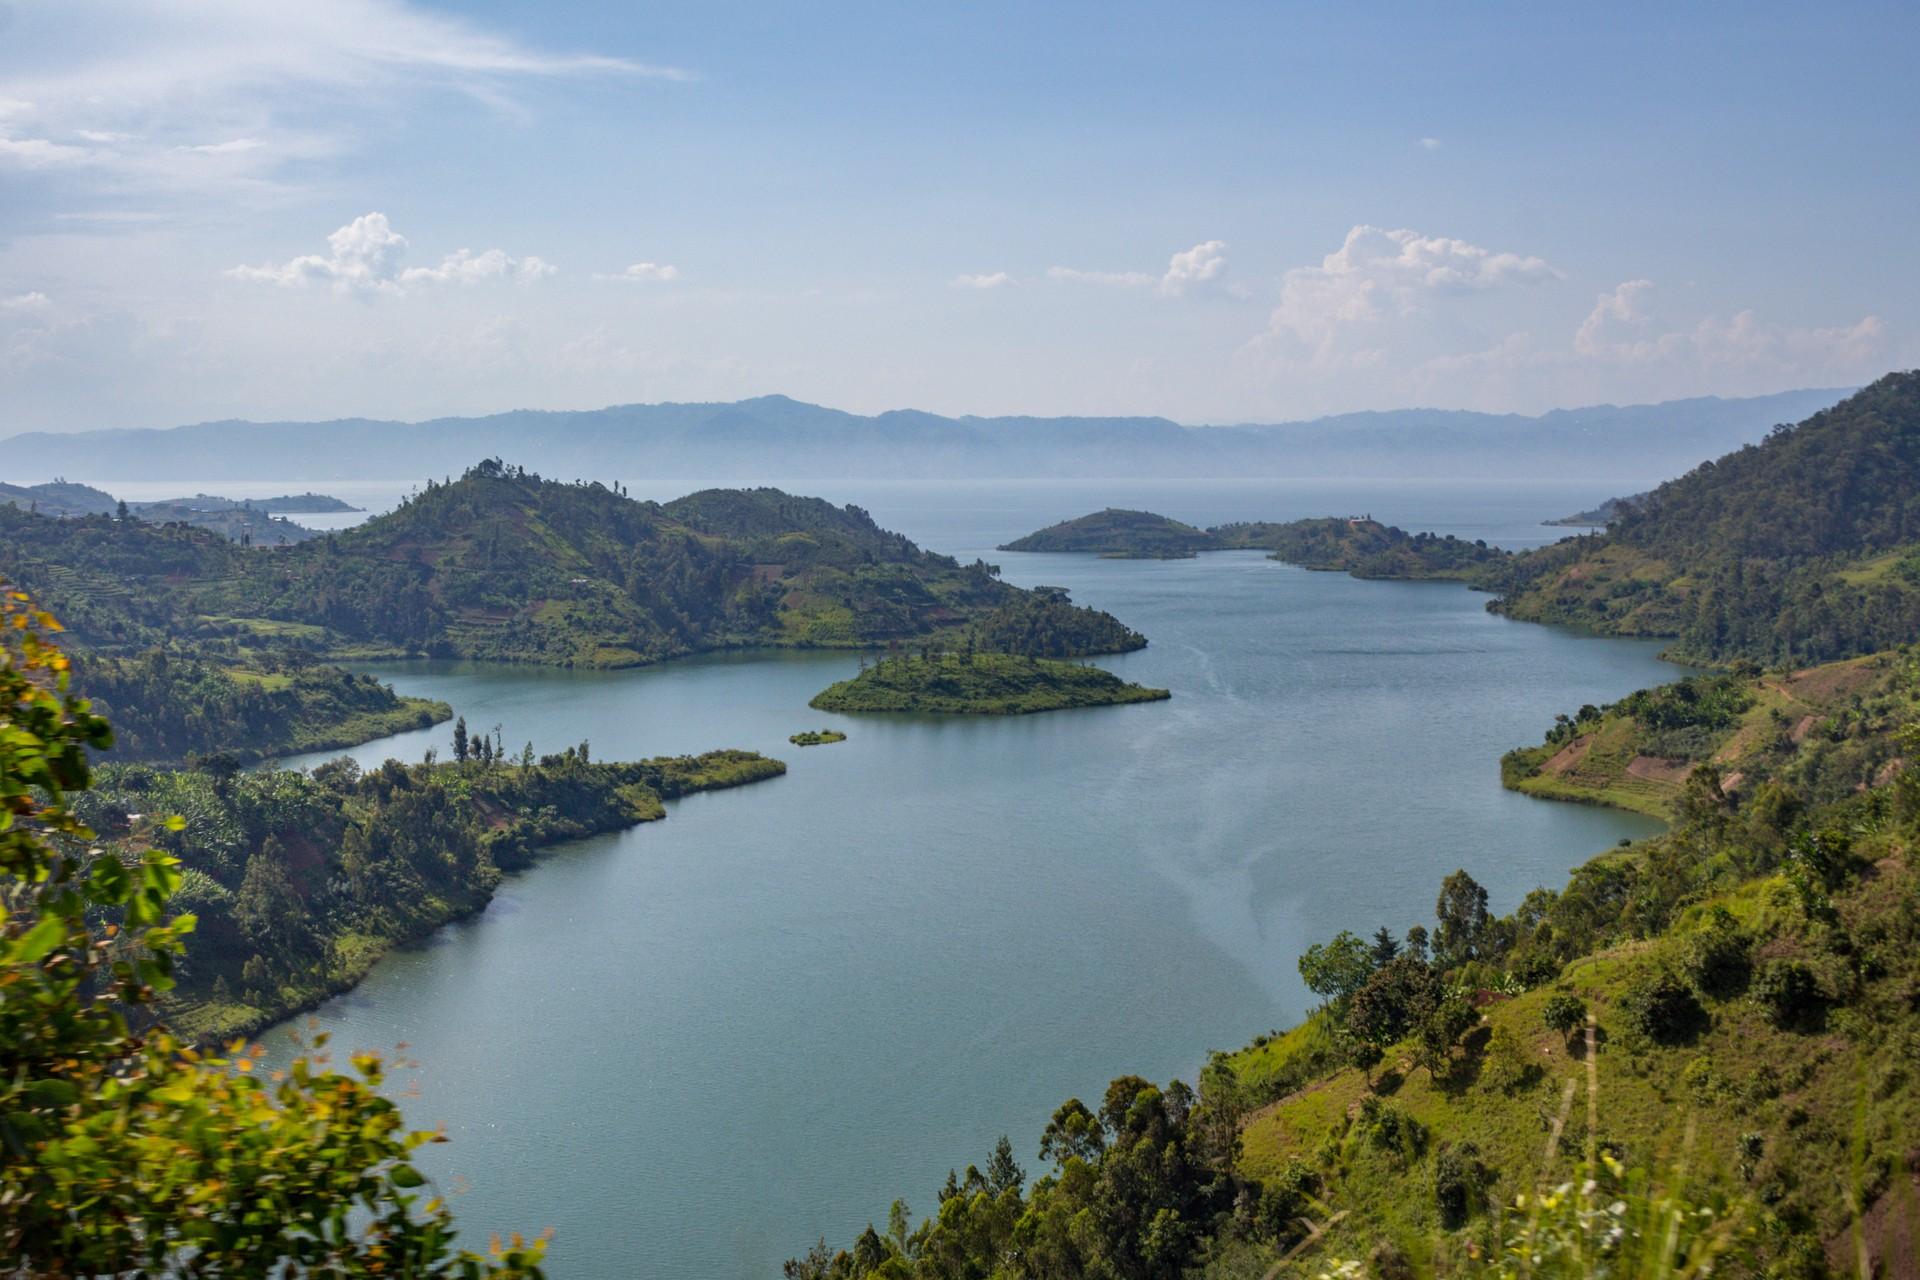 The magnificent Lake Kivu in Rwanda